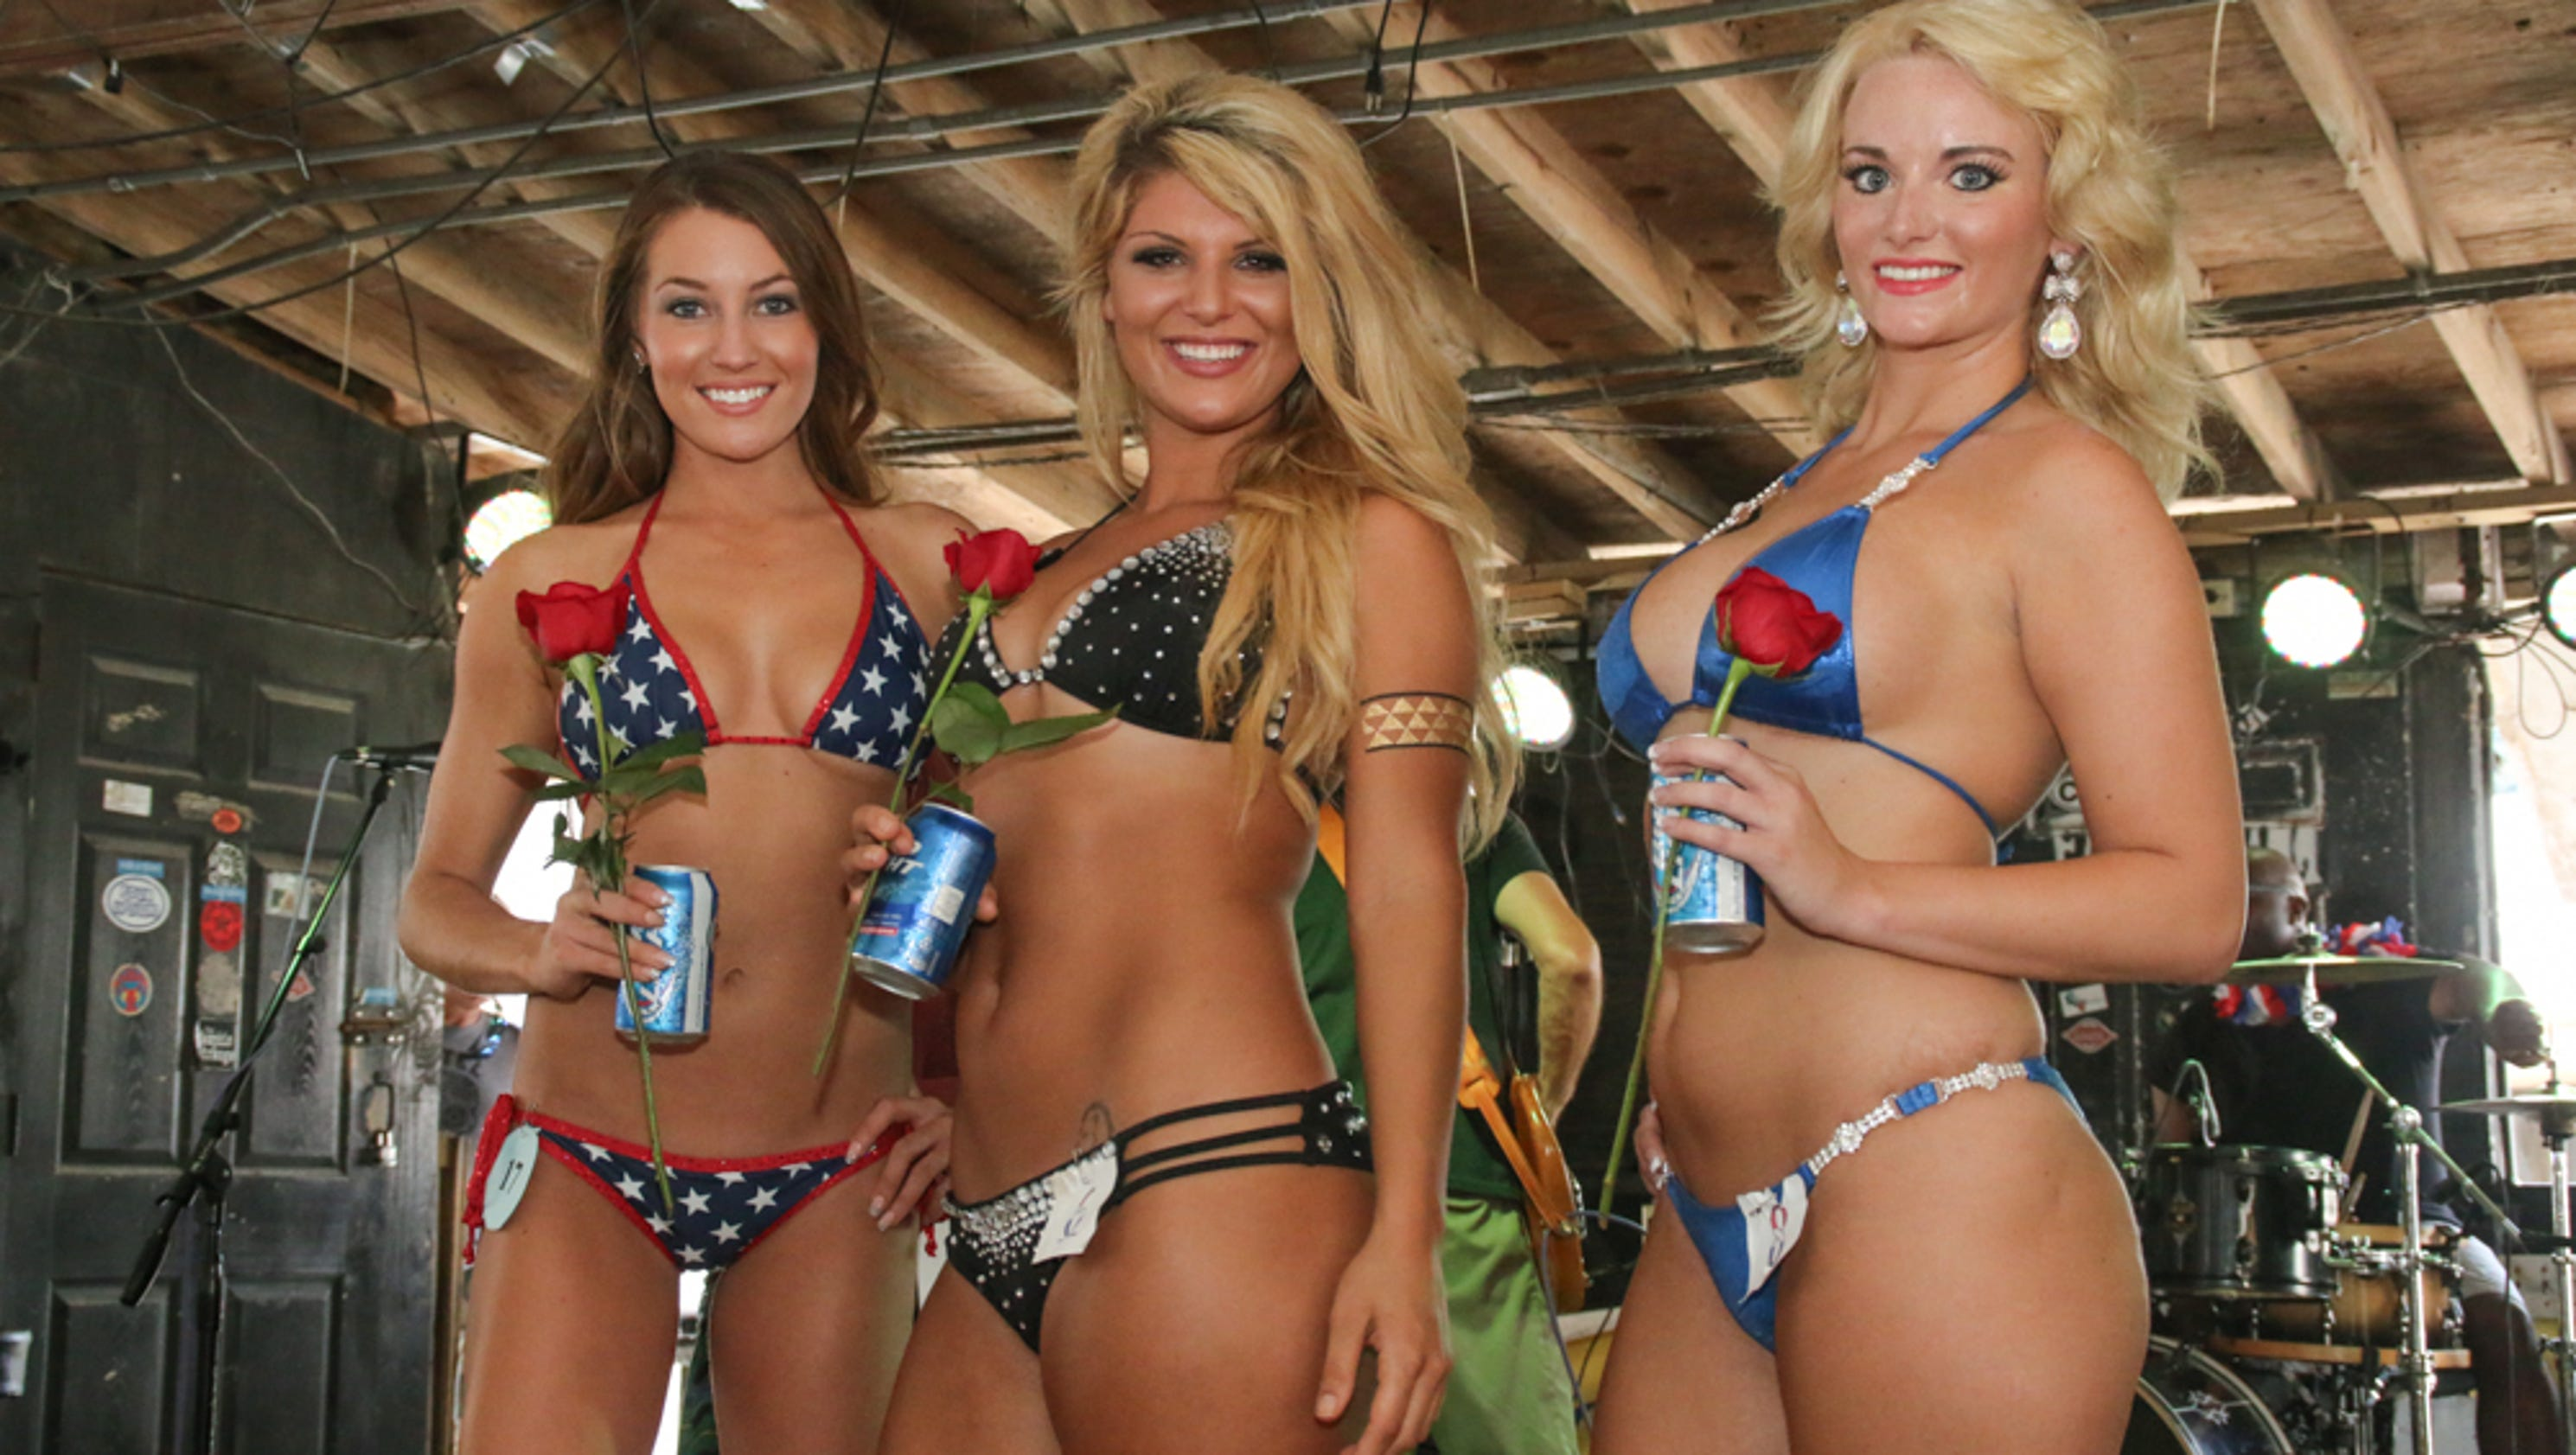 bikini Pensacola contest 2003 beach